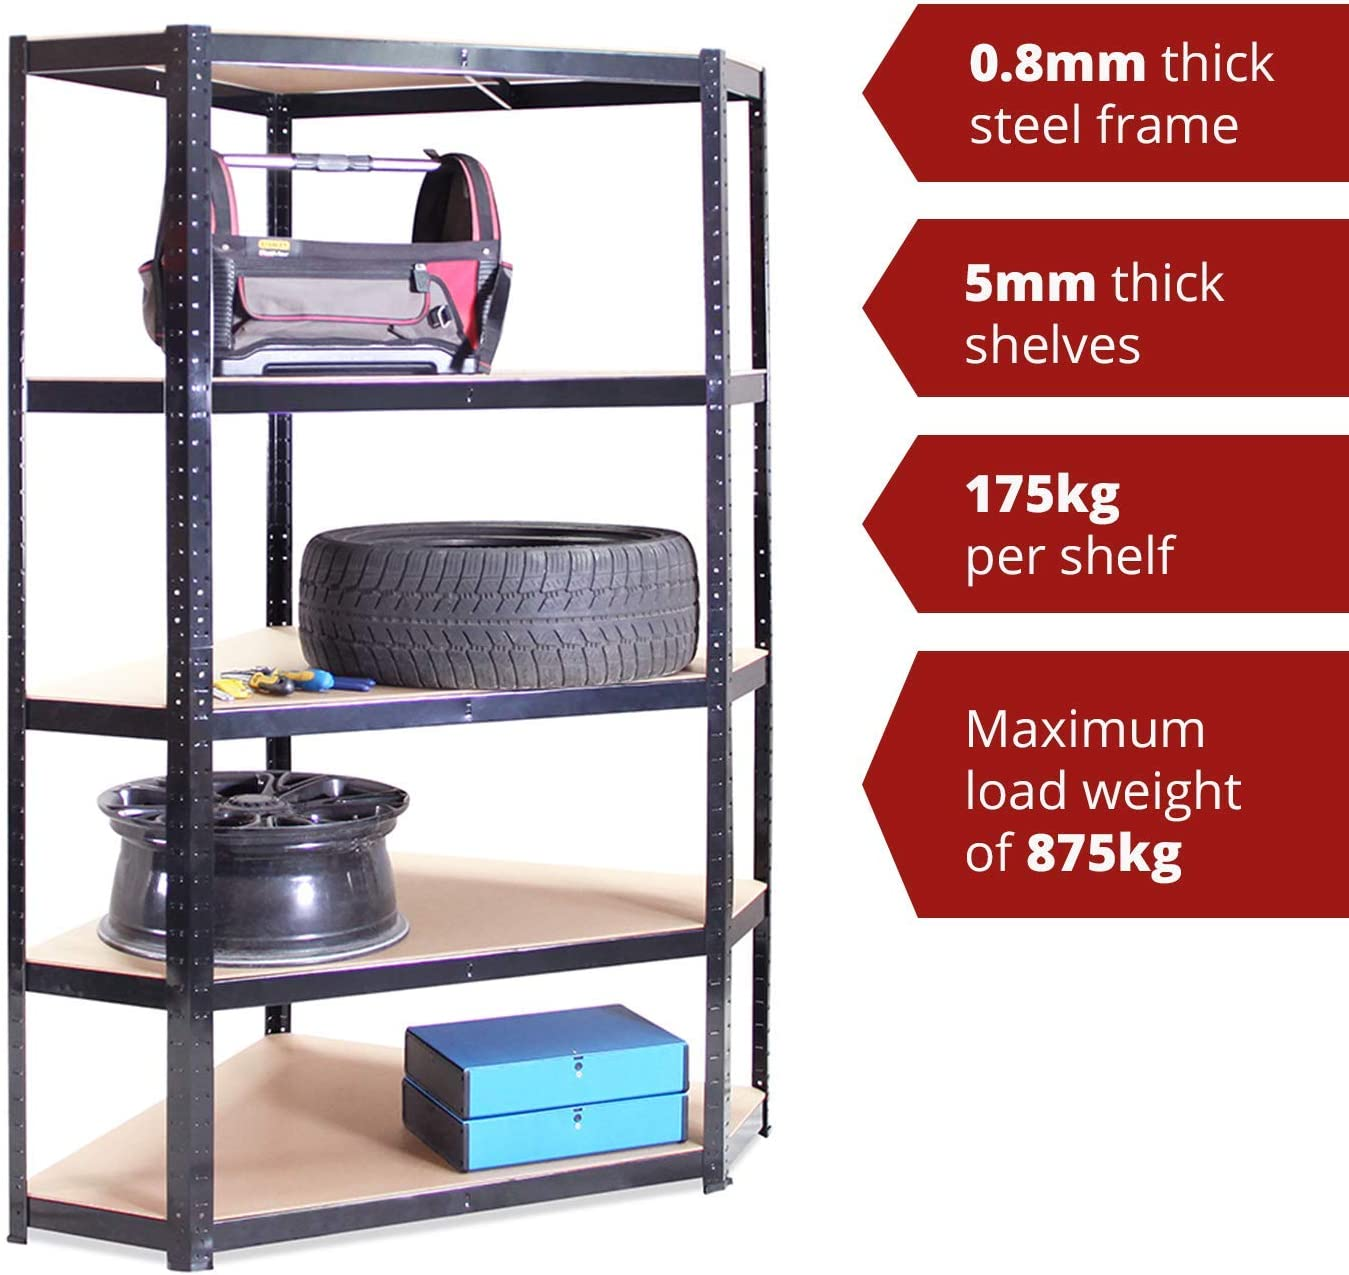 875kg Capacity Heavy Duty Black Garage Storage 5 Tier Shelving Rack Corner Shelving Unit 180 x 90 x 45